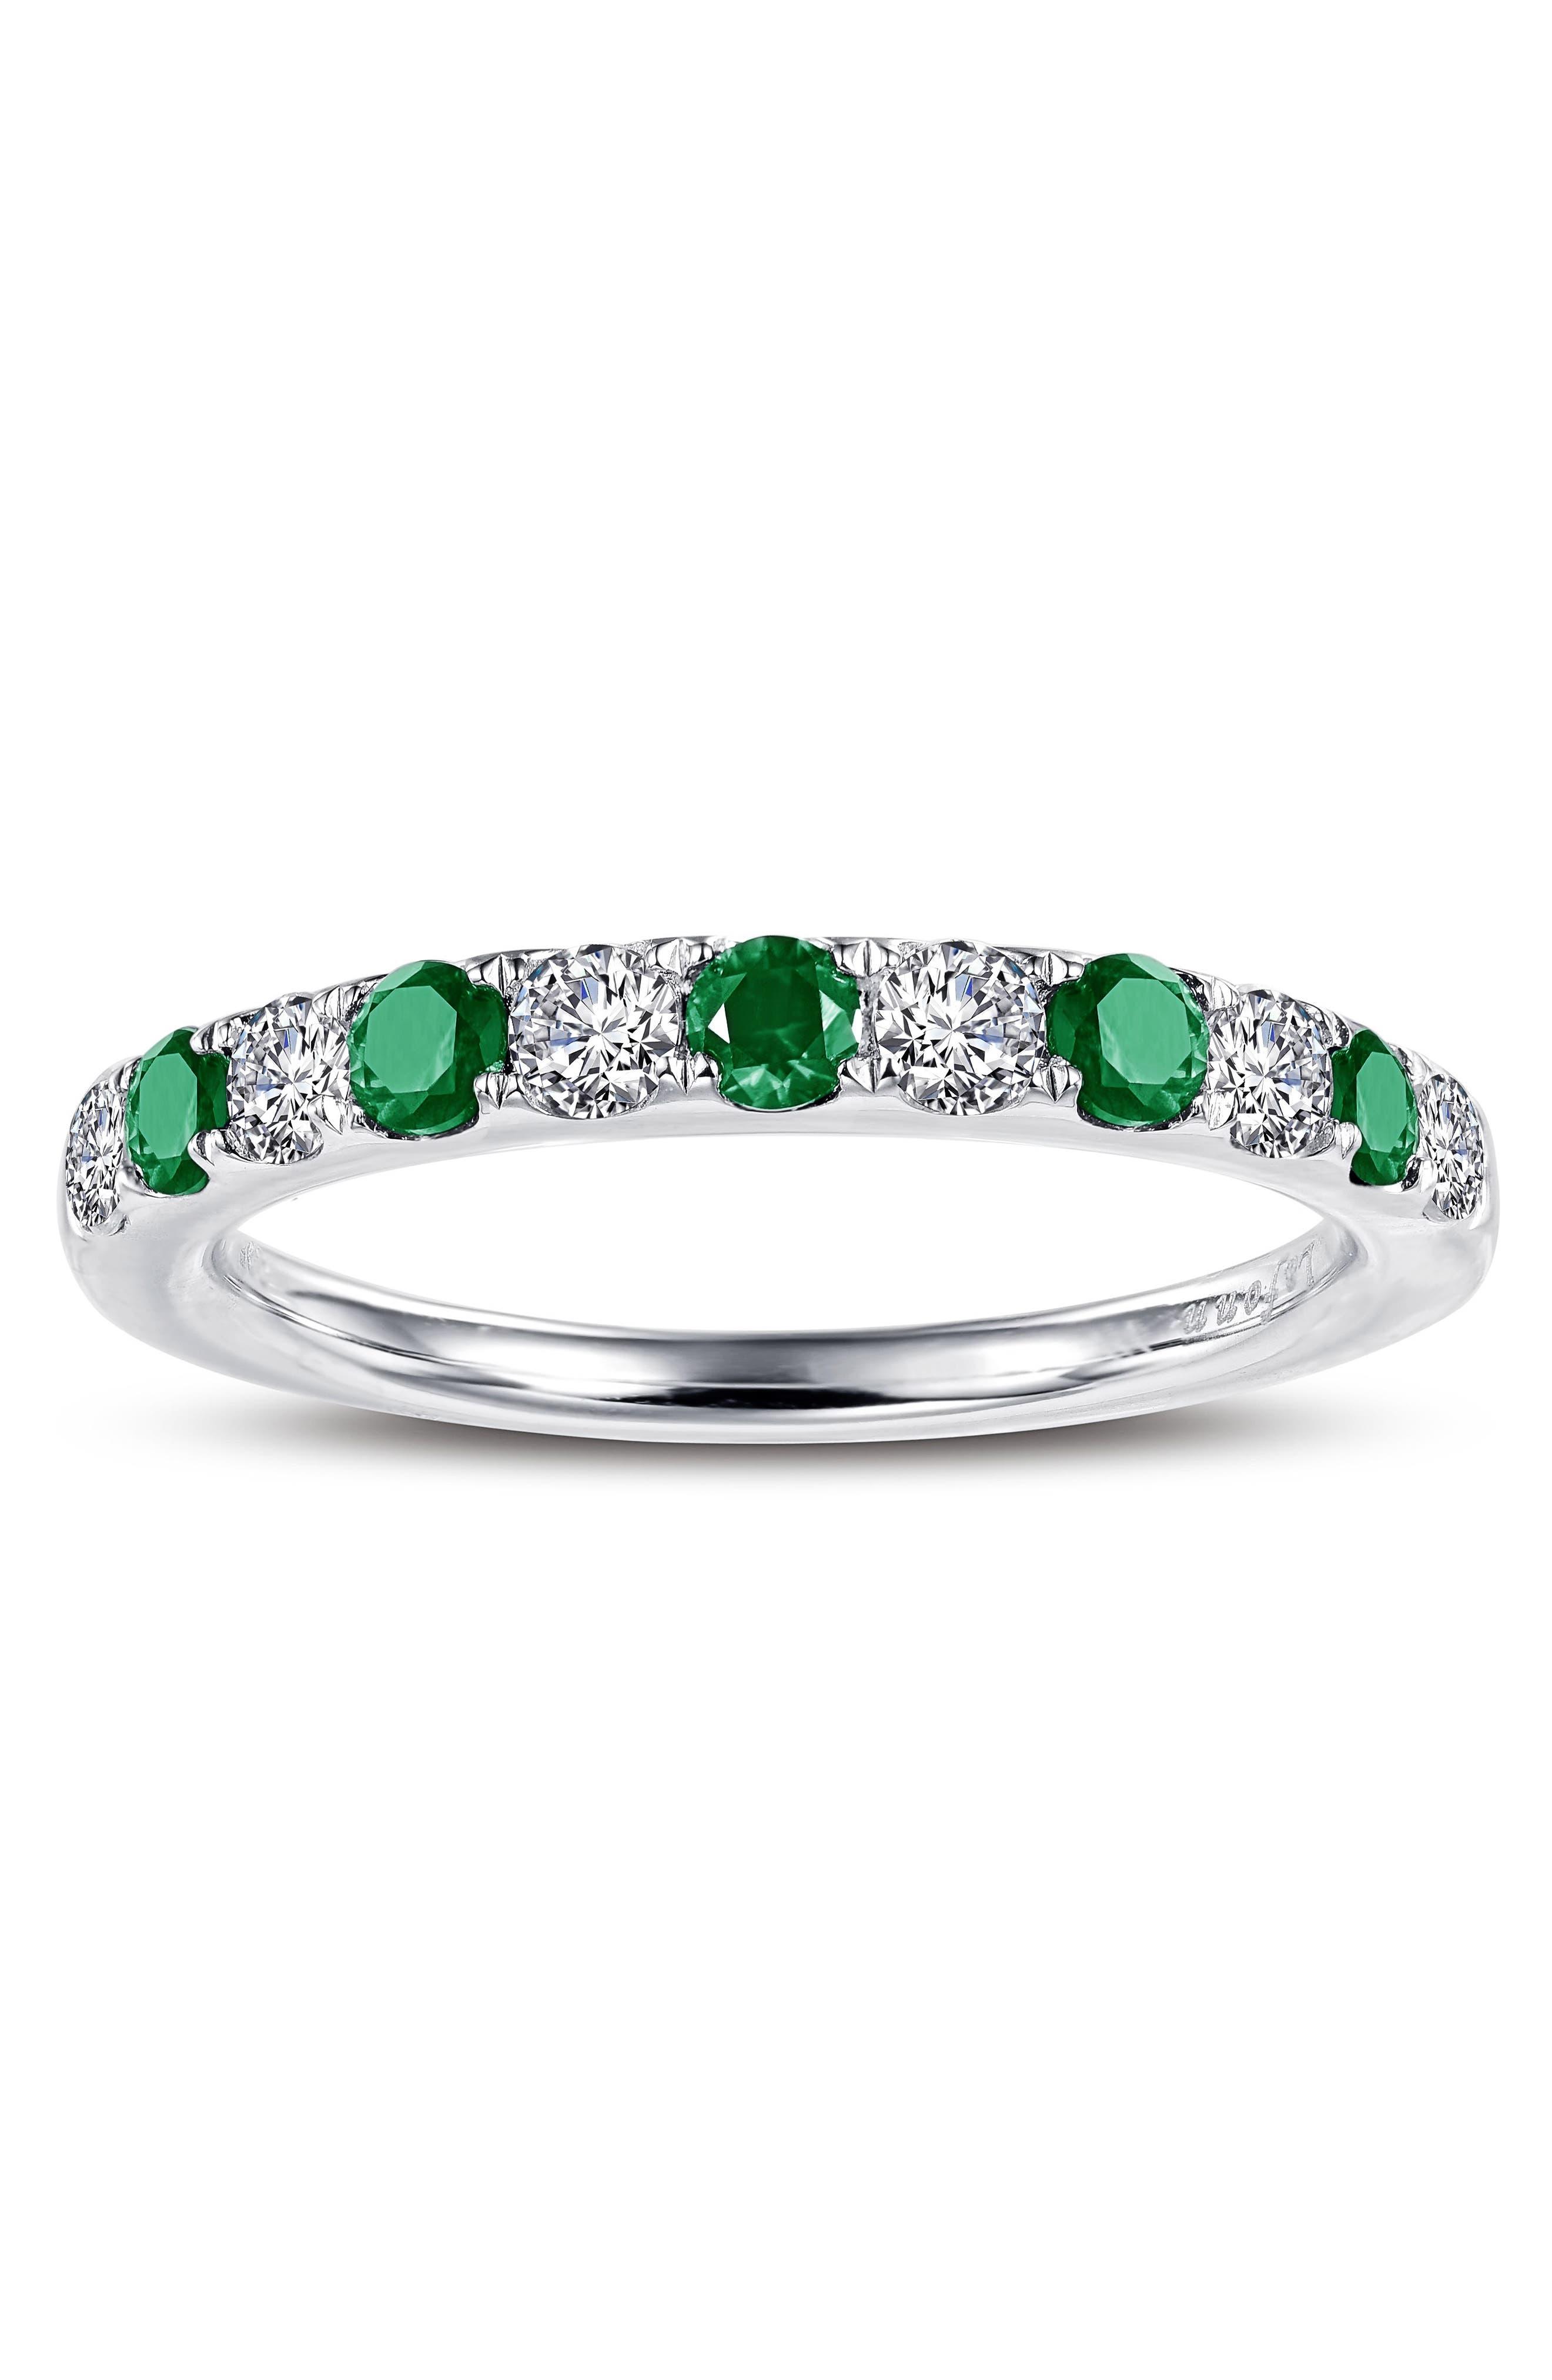 Simulated Diamond Birthstone Band Ring,                             Alternate thumbnail 2, color,                             MAY - GREEN/ SILVER